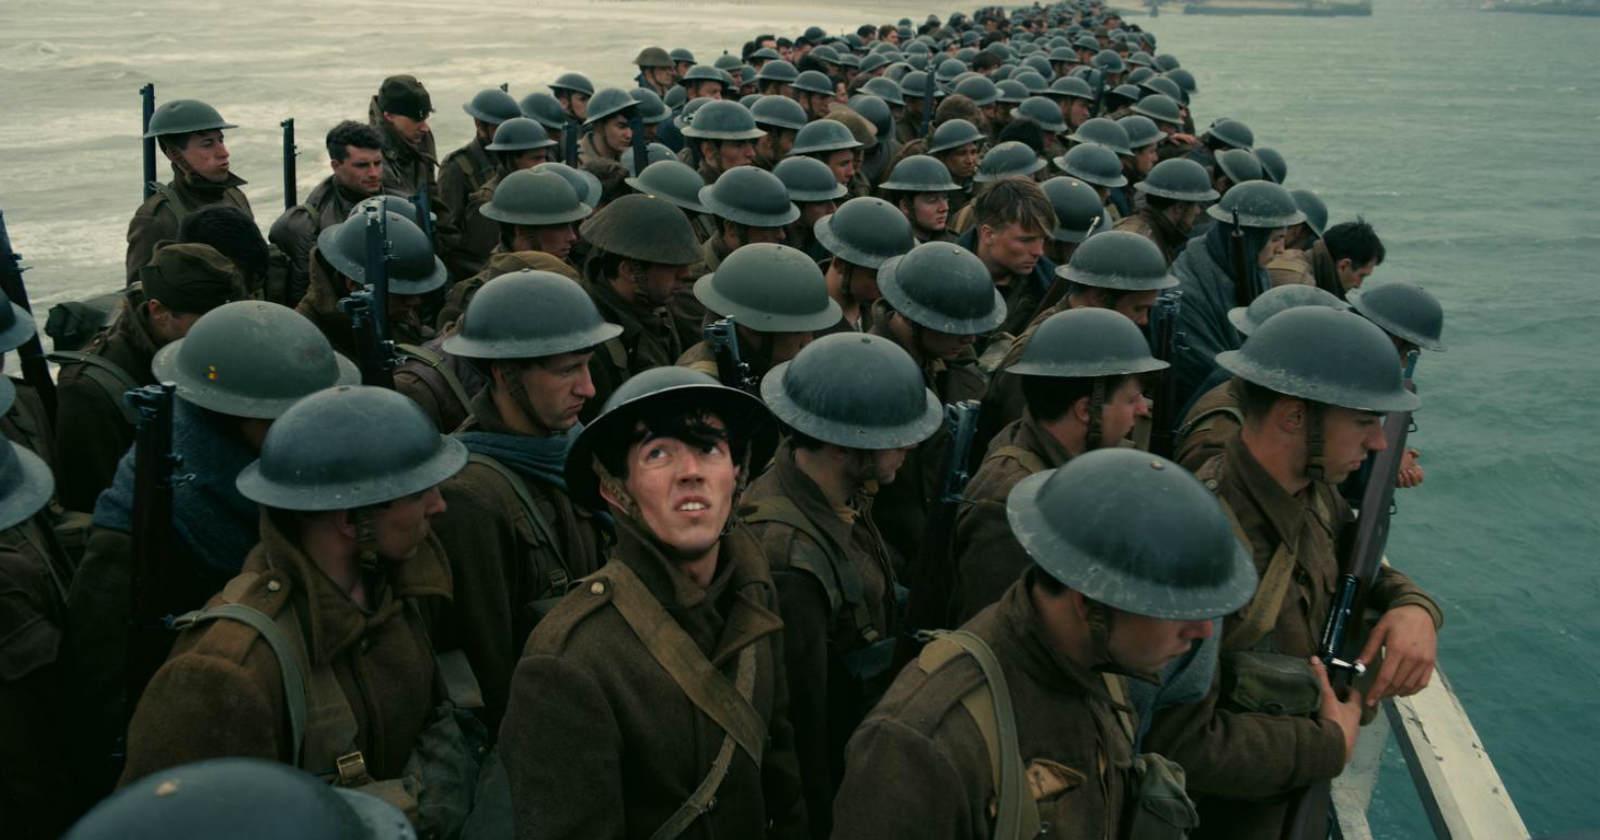 Dunkerque: la película de Christopher Nolan sobre la Segunda Guerra Mundial ya está en Netflix